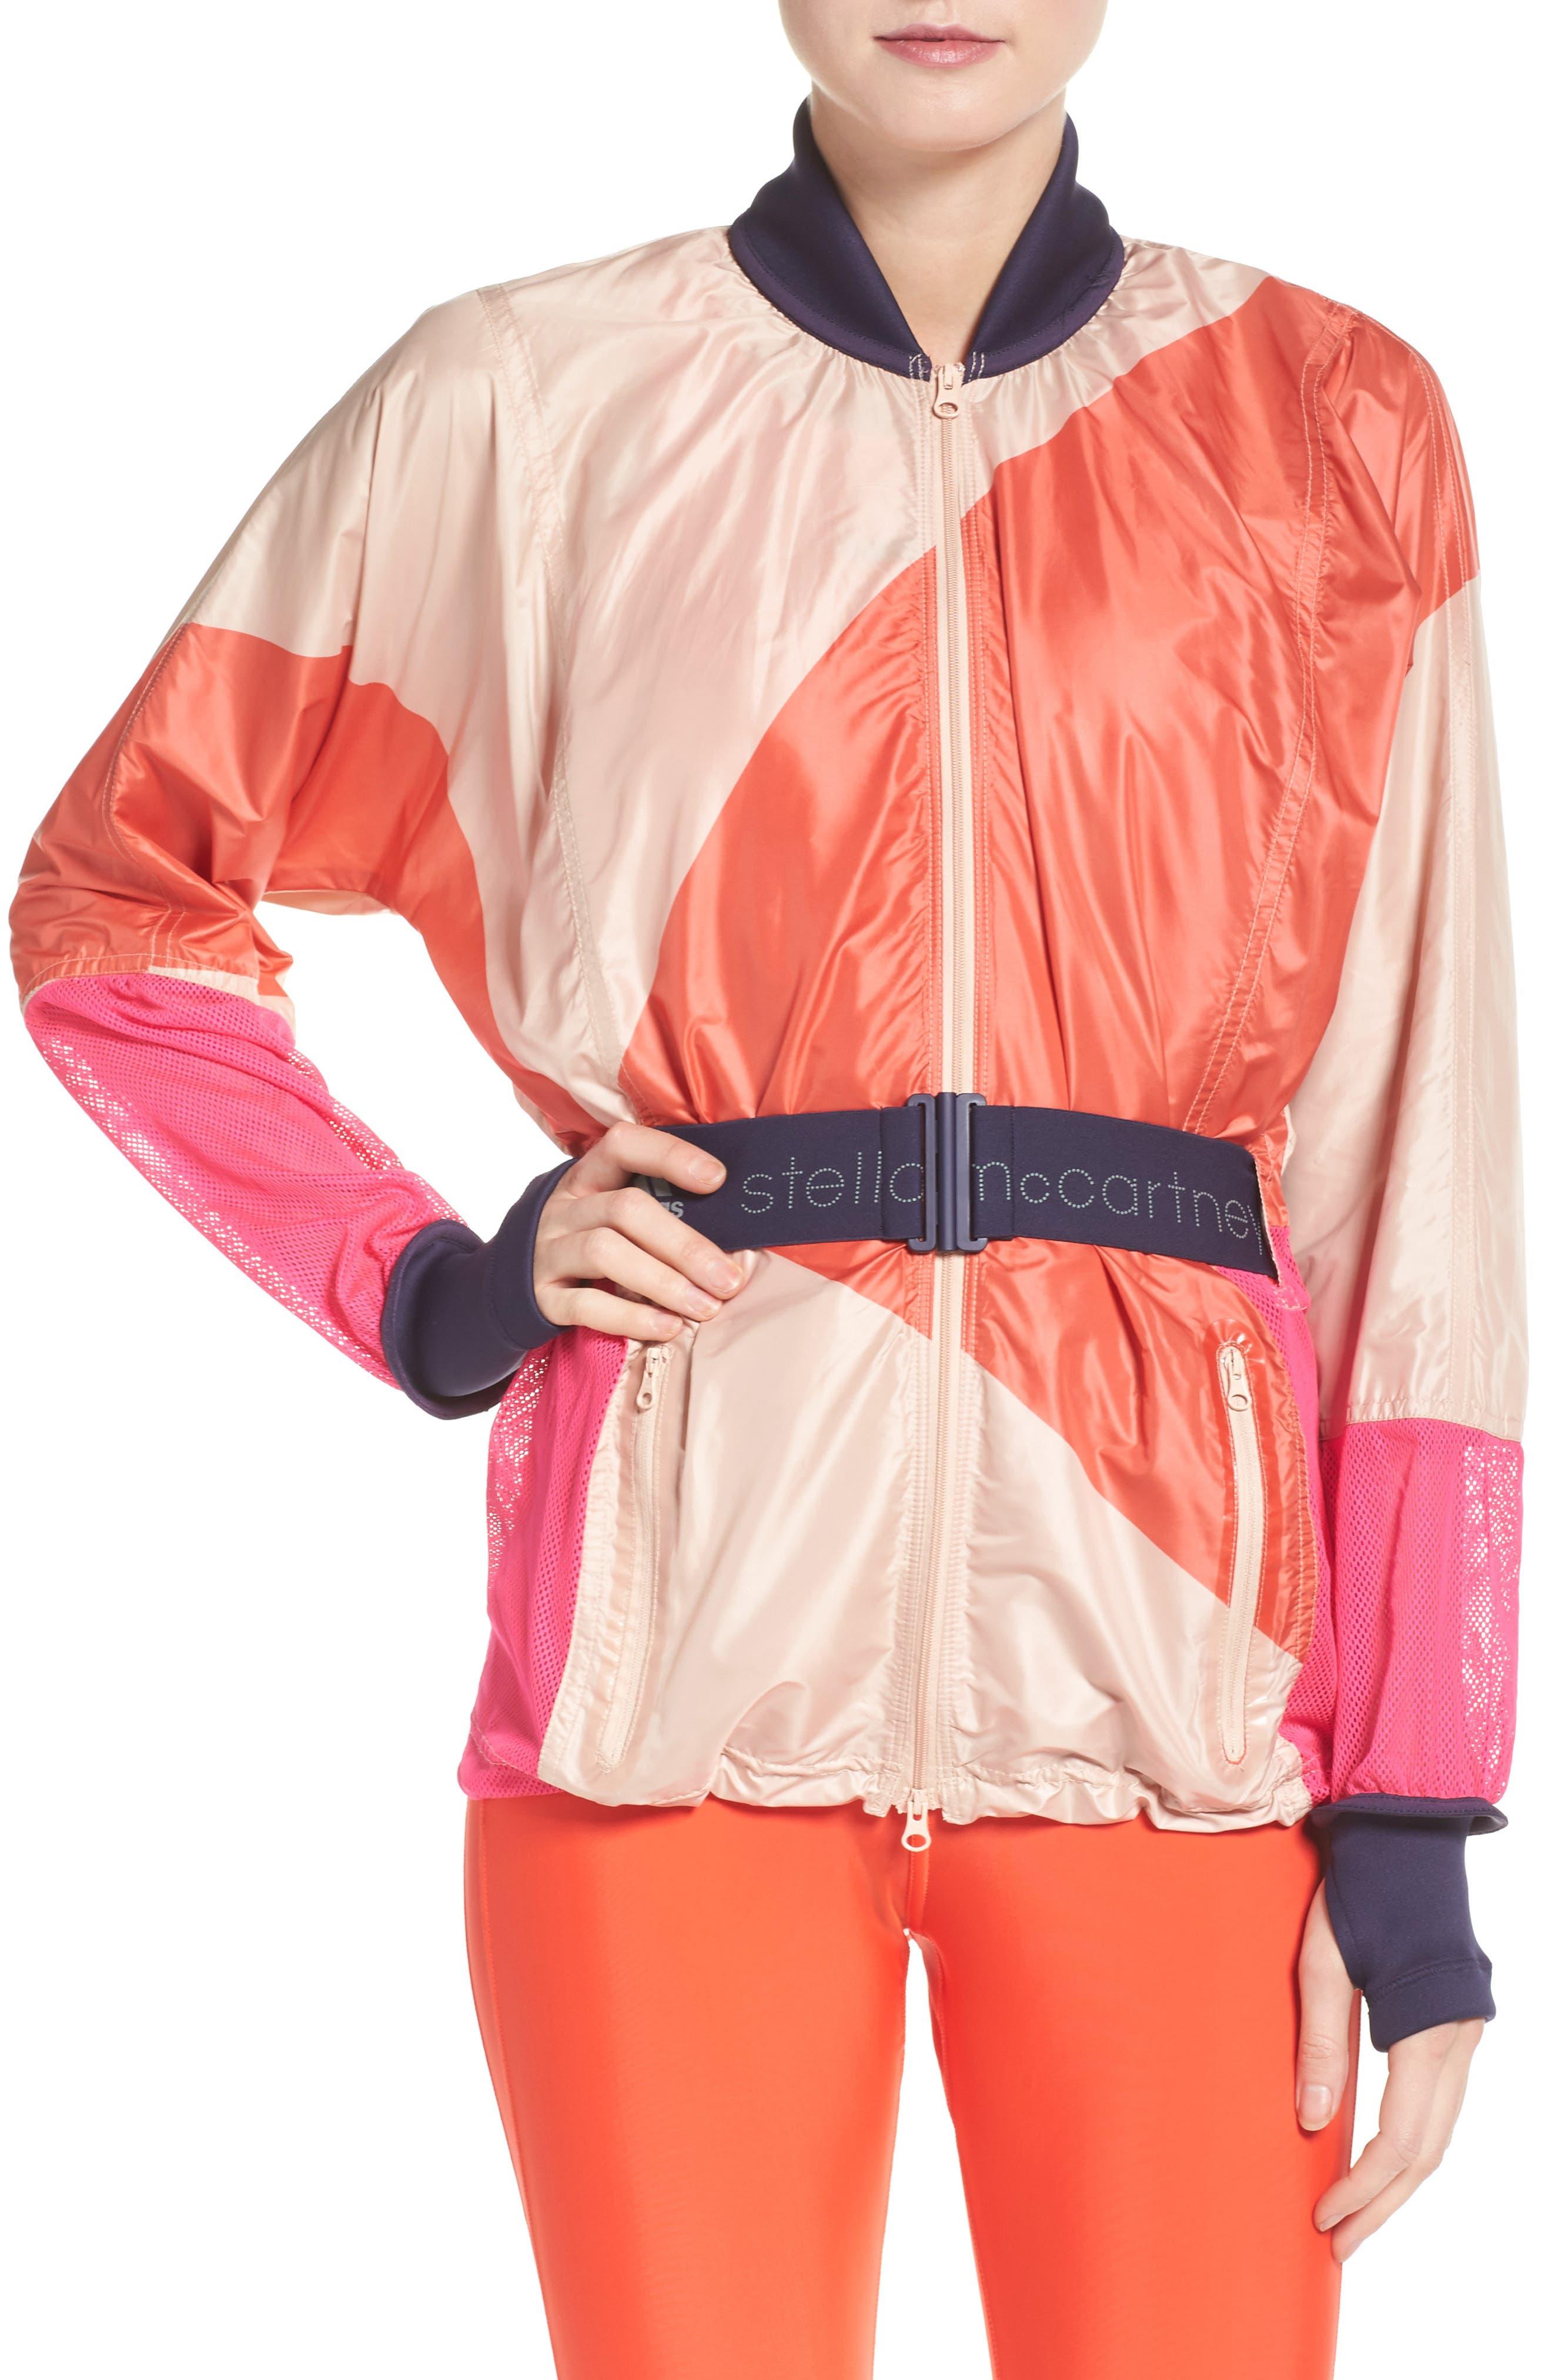 Kite Climastorm<sup>®</sup> Run Jacket,                         Main,                         color, 600